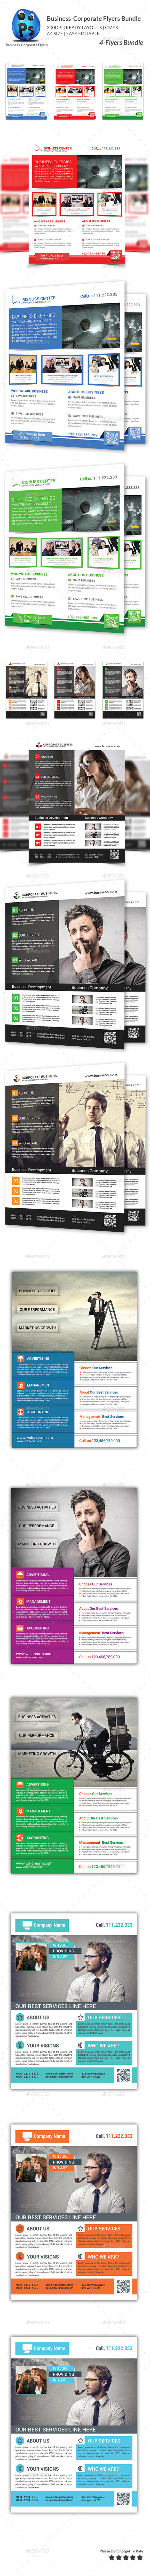 GraphicRiver Business Flyers Bundle Templates 9658298